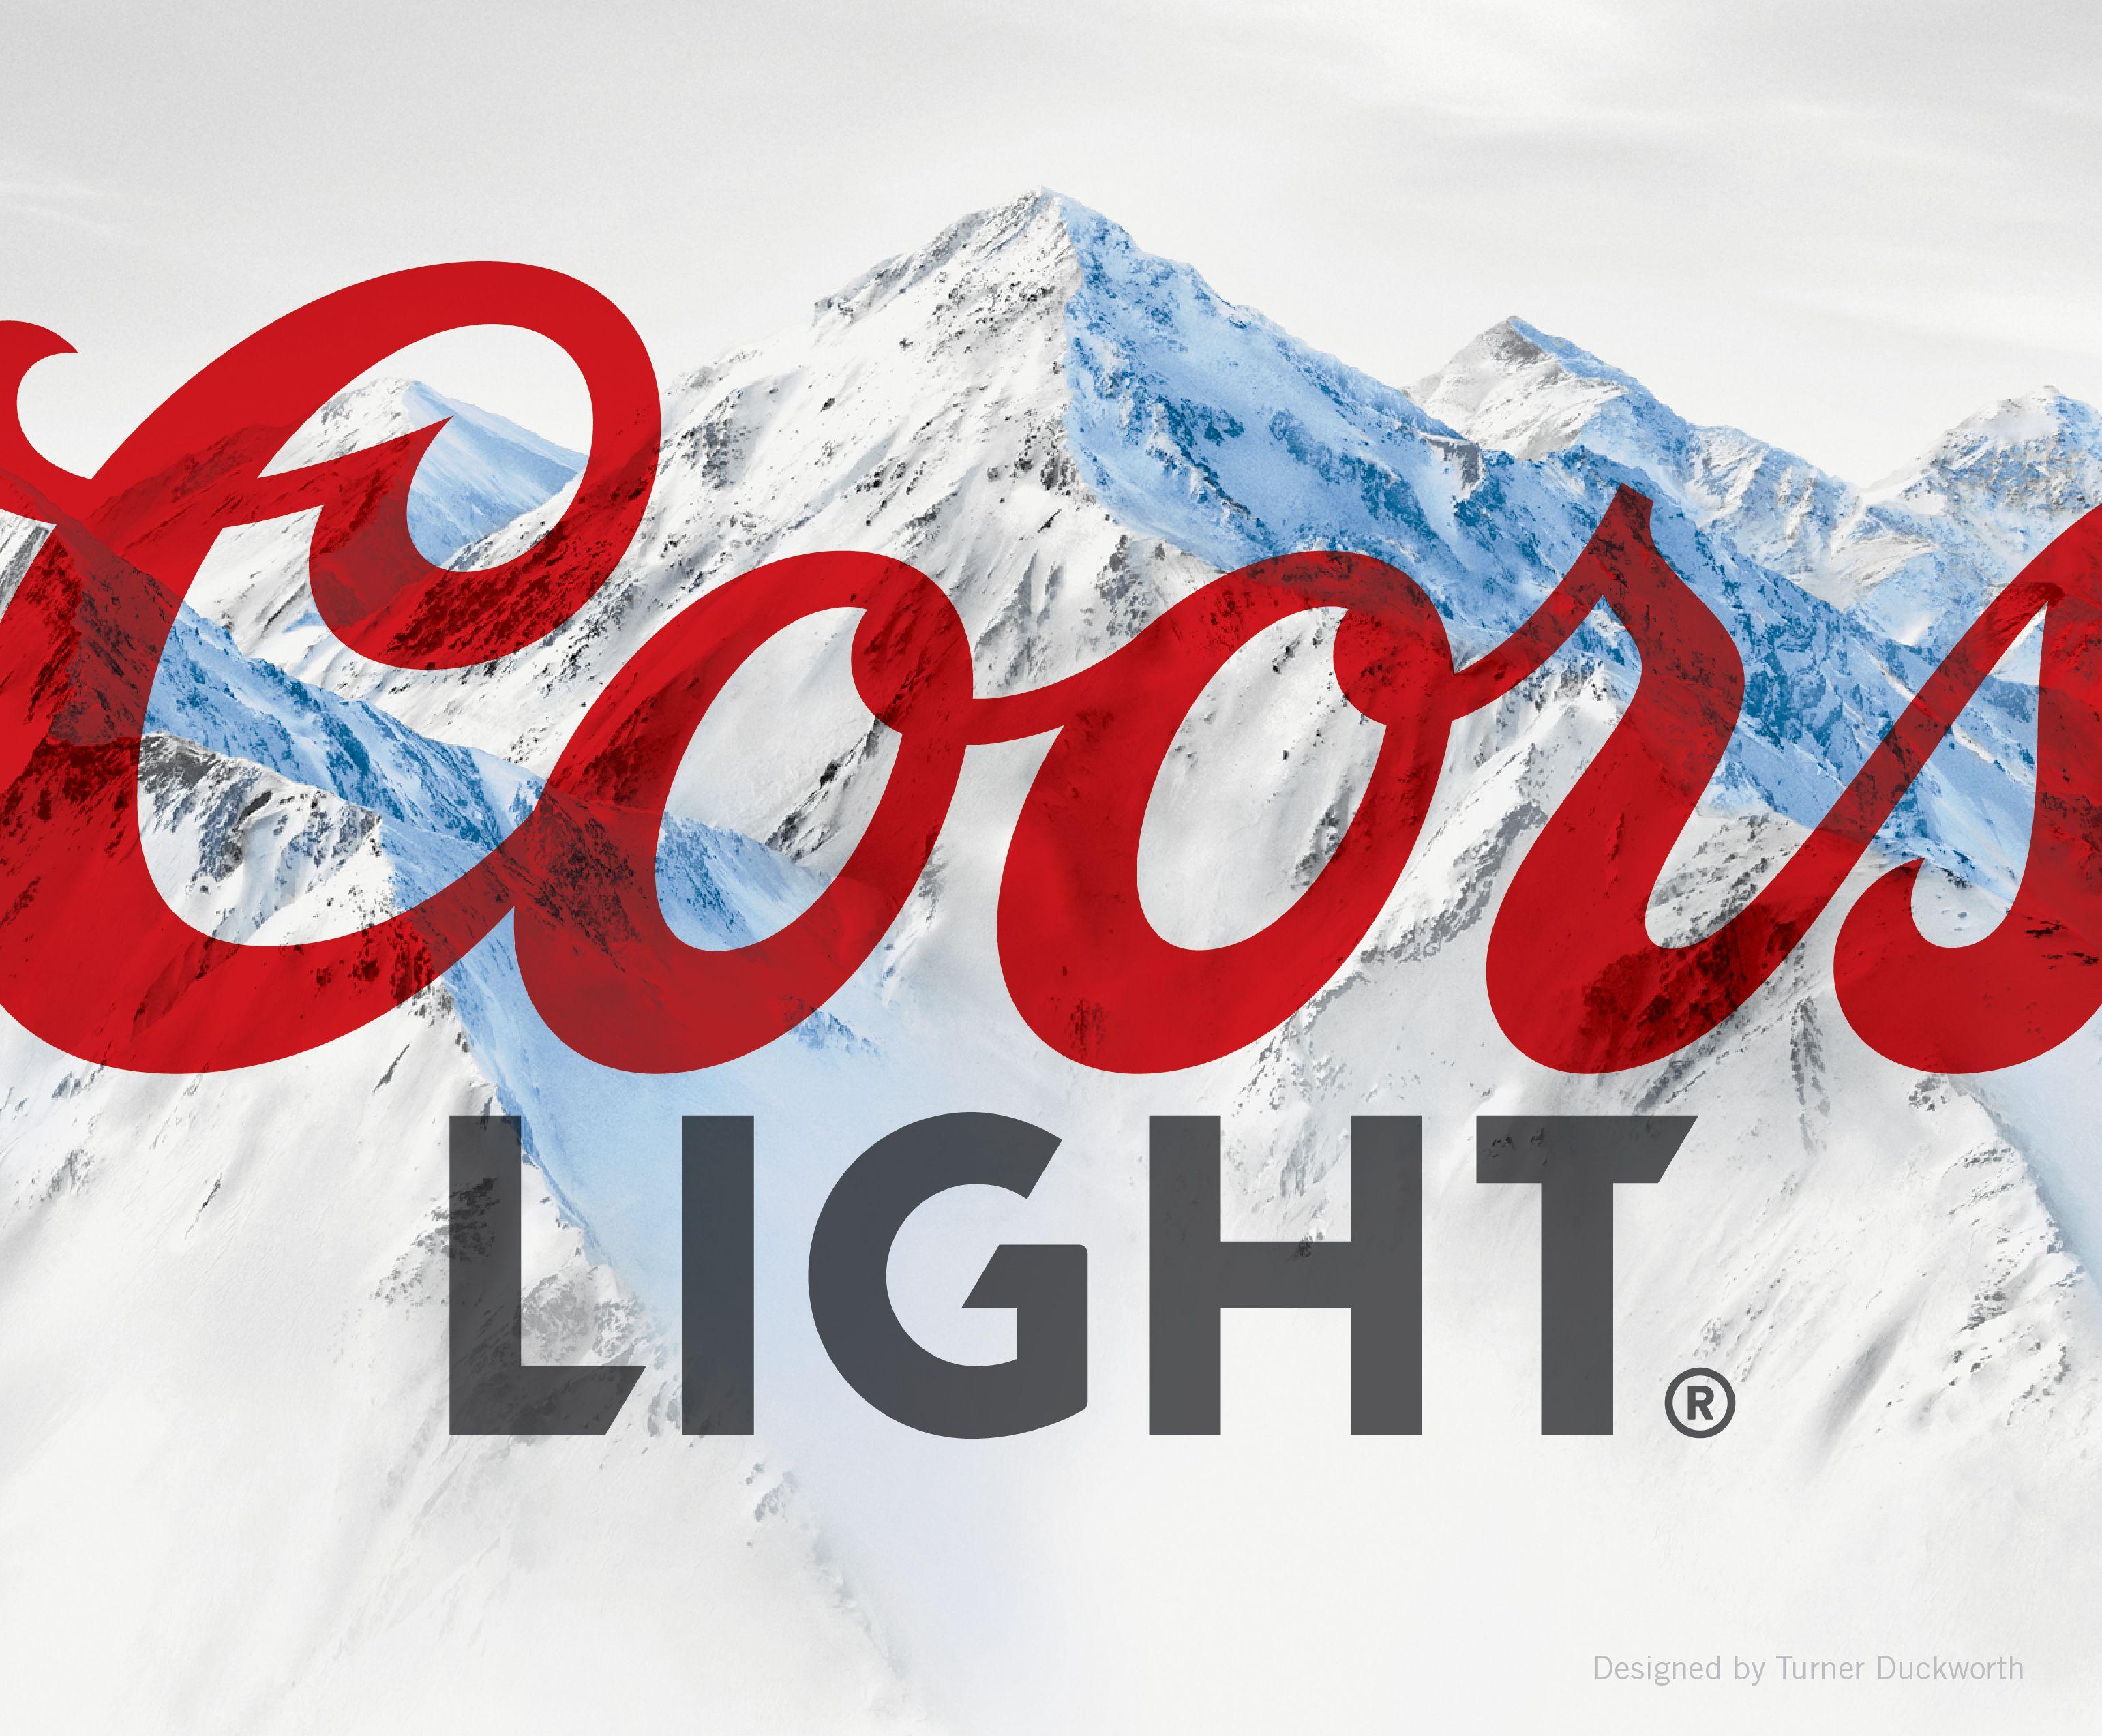 Coors Light Visual Identity. Designed by Turner Duckworth